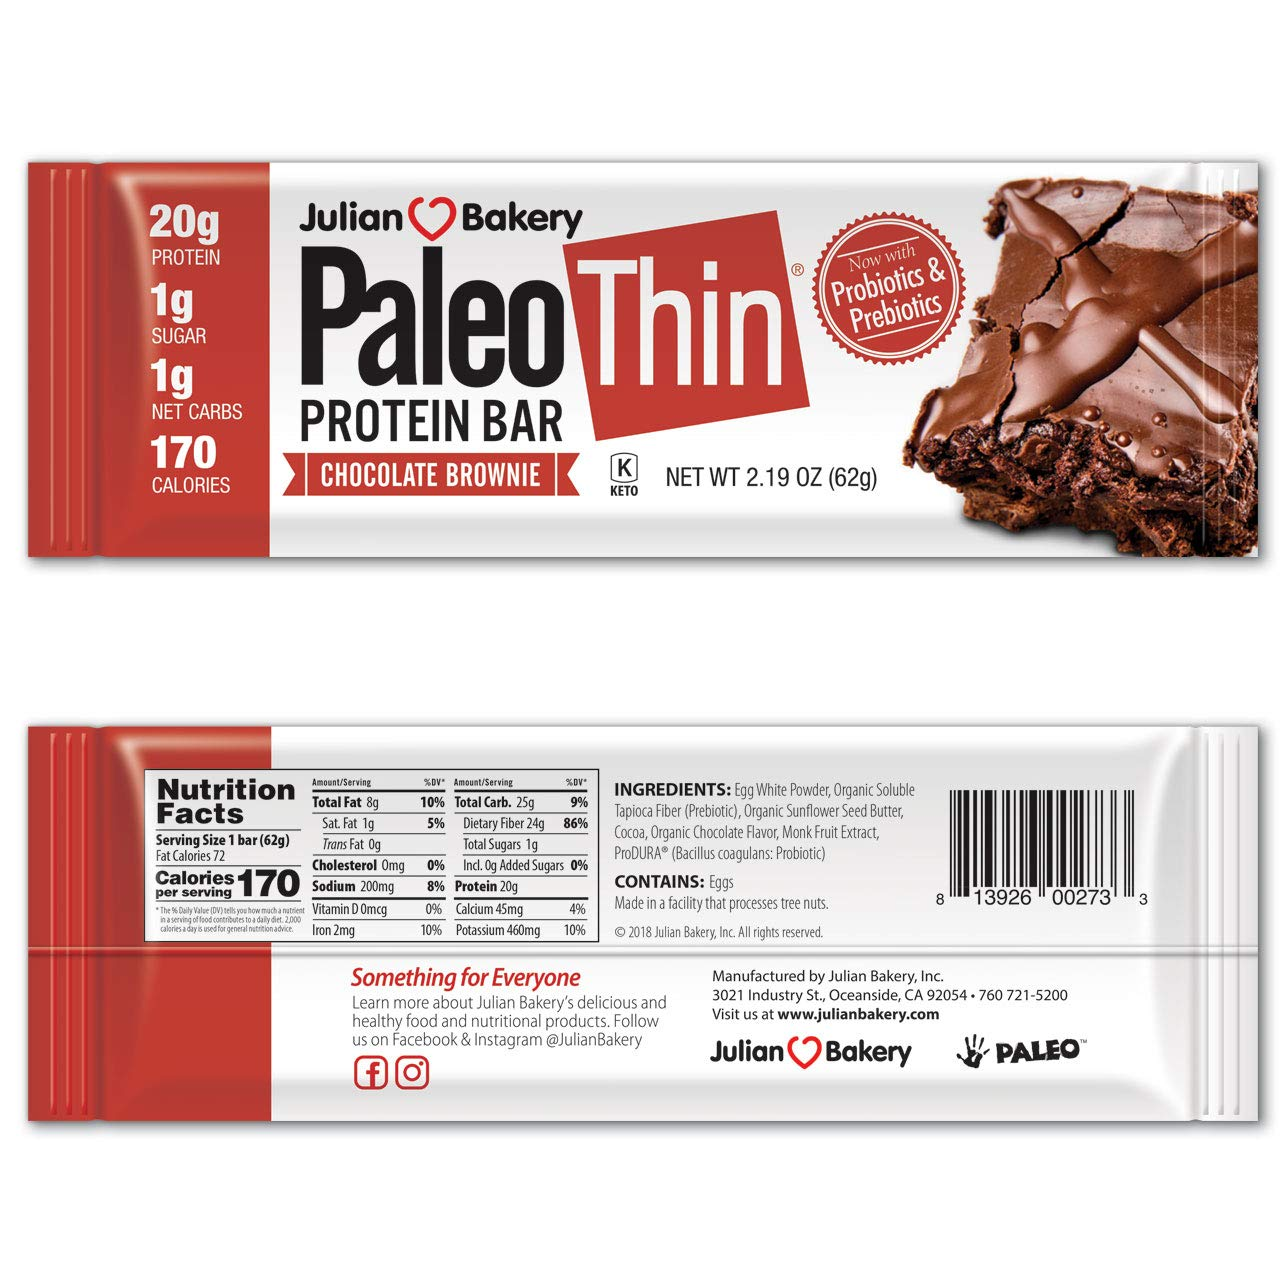 Julian Bakery Paleo Thin Protein Bars (Chocolate Brownie) (Gluten-Free) (1g Sugar) 12 Bars